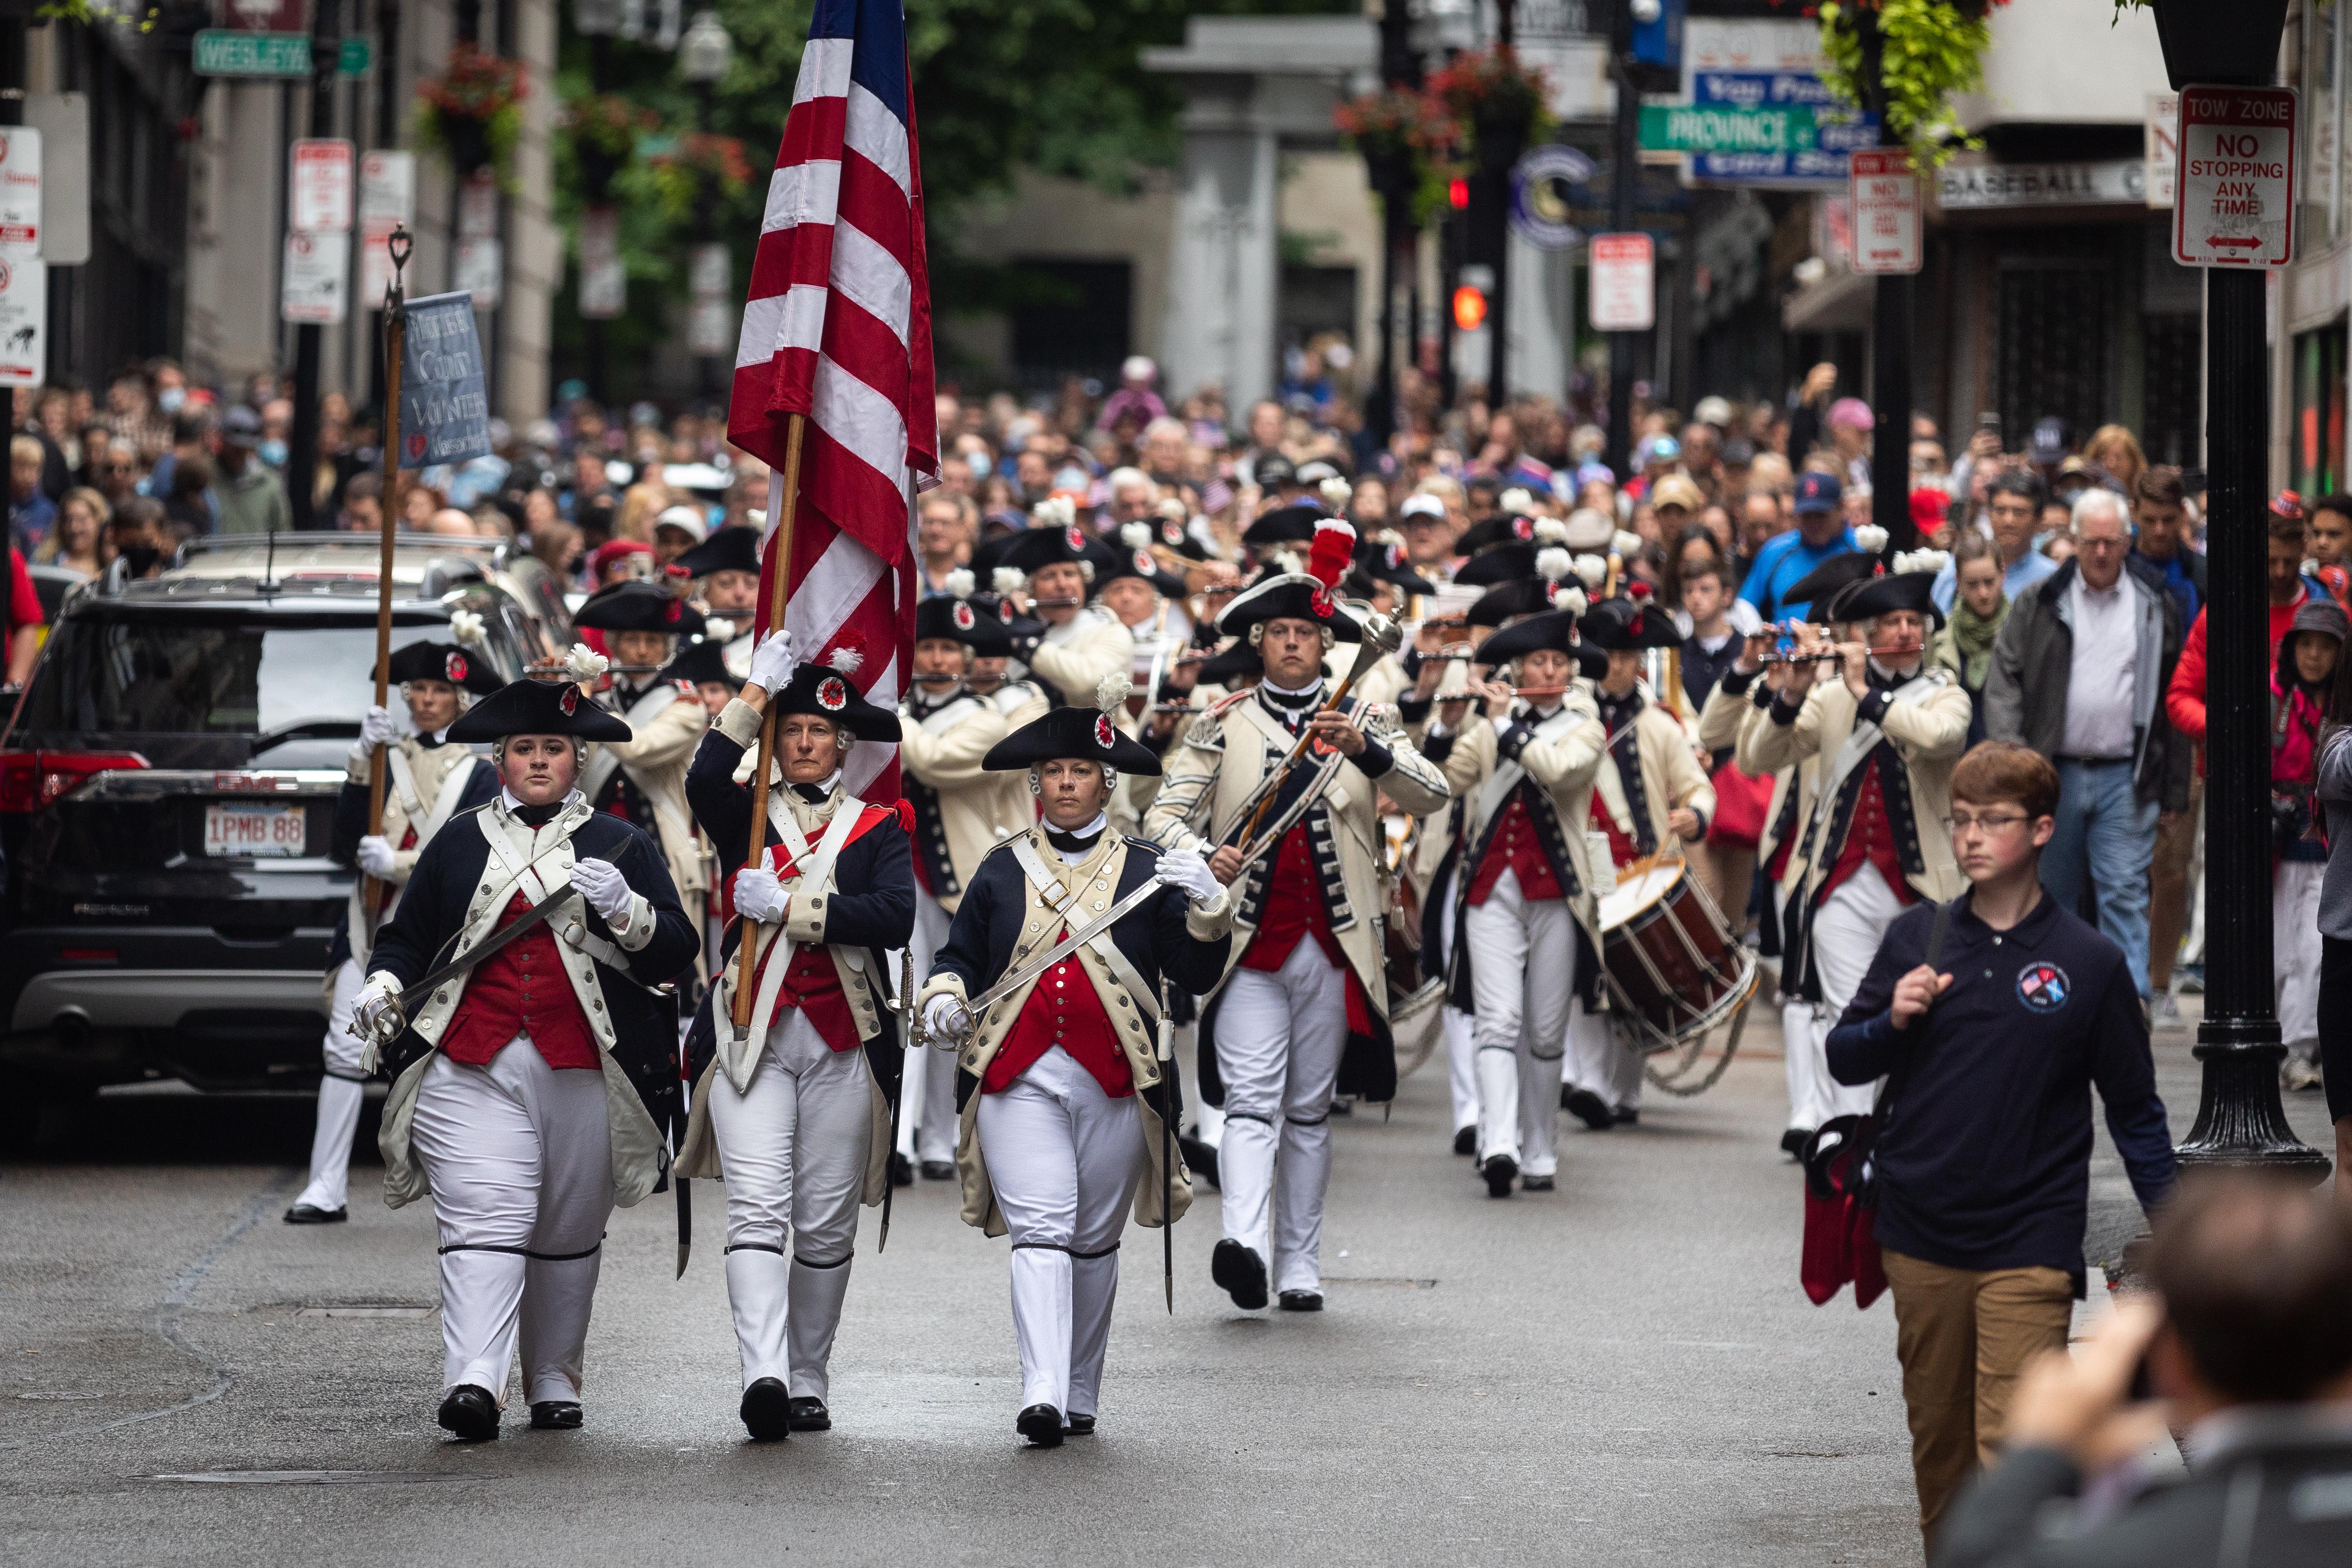 Anggota sukarelawan Middlesex County berbaris dari Granary Burial Grounds ke State House lama selama parade pada 4 Juli di Boston, MA.